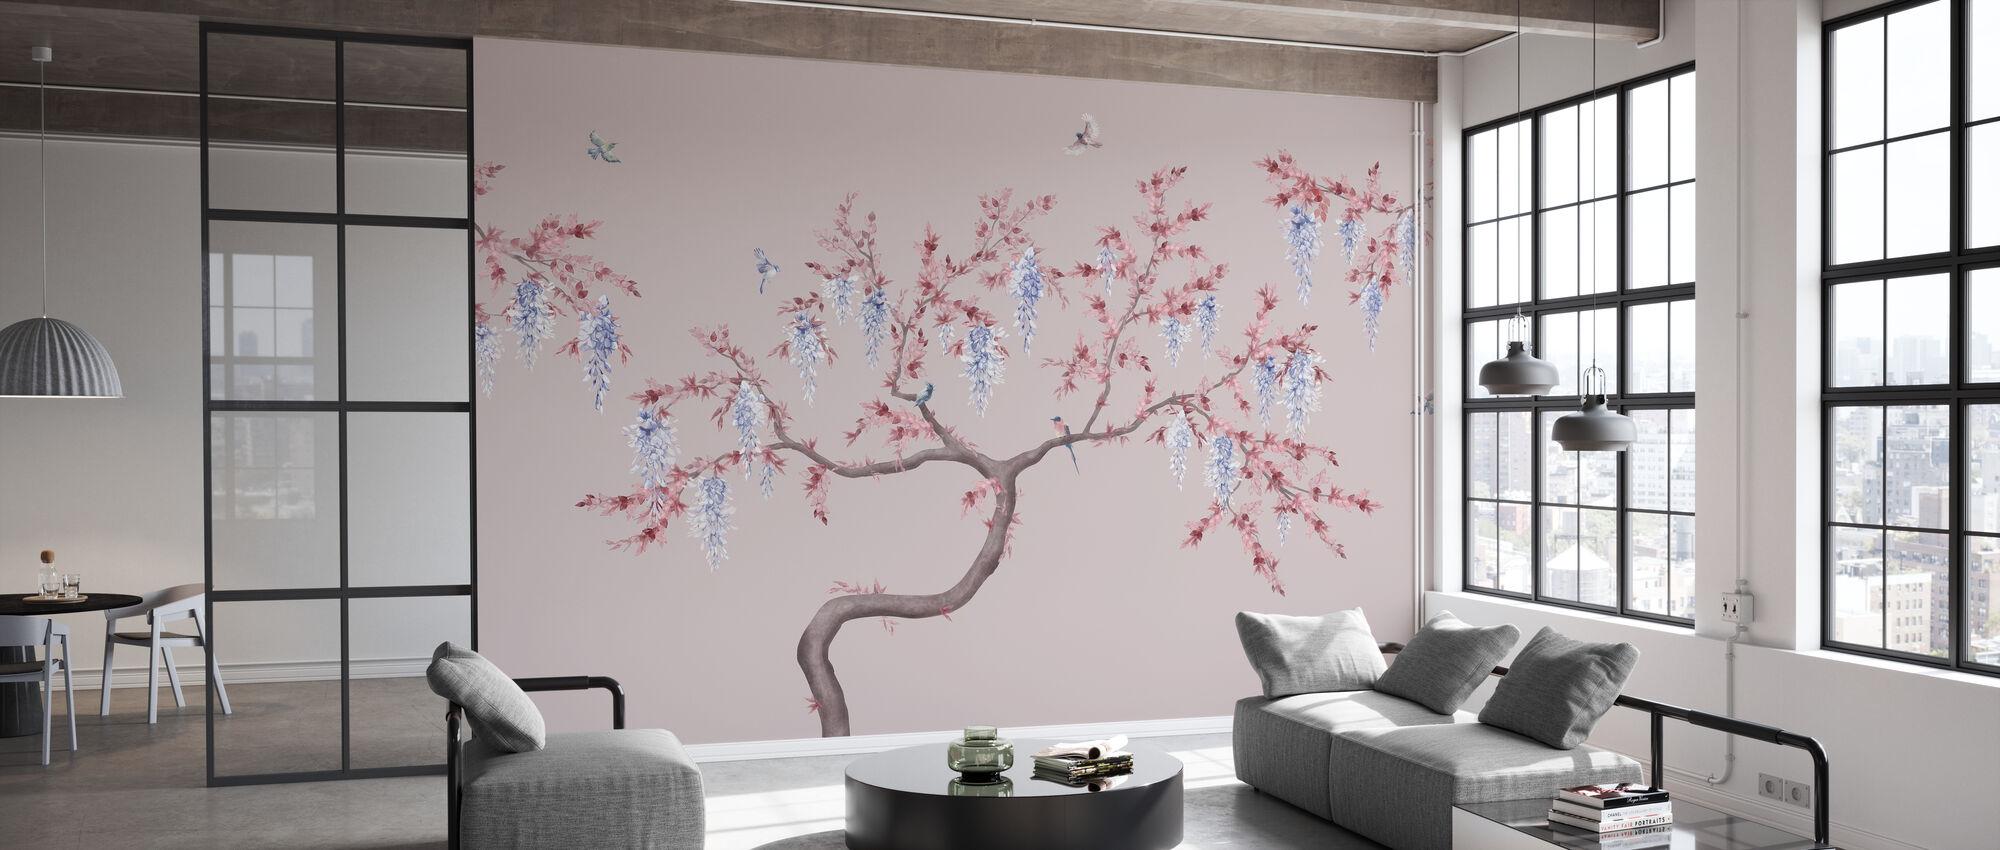 Ineffable Baum - Rosa Blau - Tapete - Büro